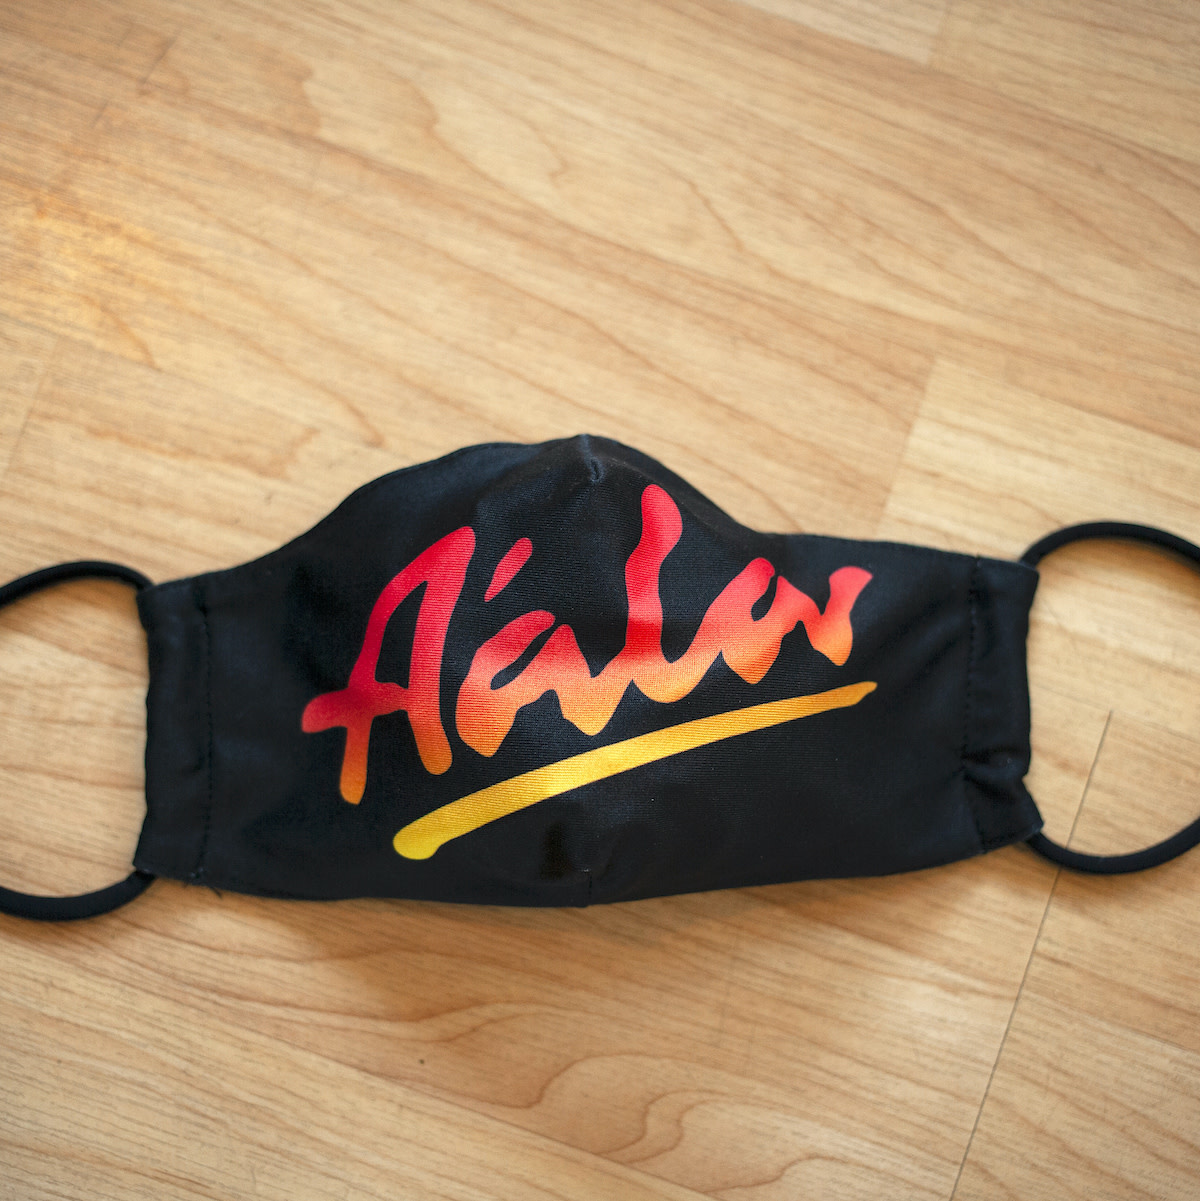 APB Skateshop APB A'alva Face Mask Black